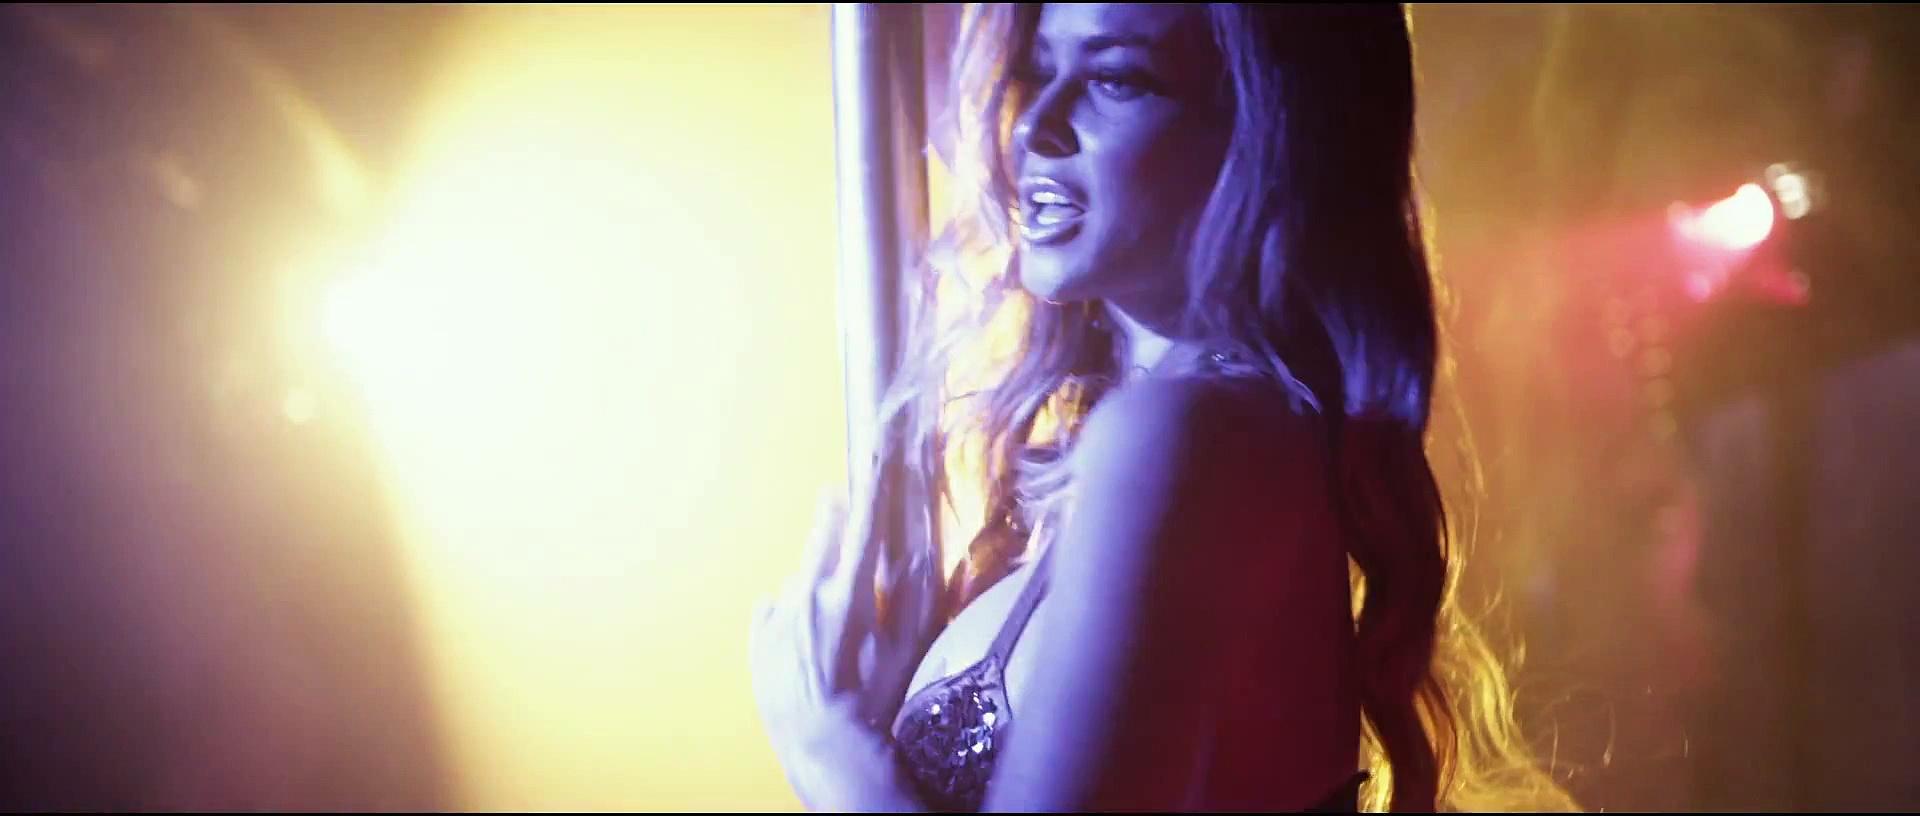 Lap Dance – Official Trailer (2014) Carmen Electra, Briana Evigan